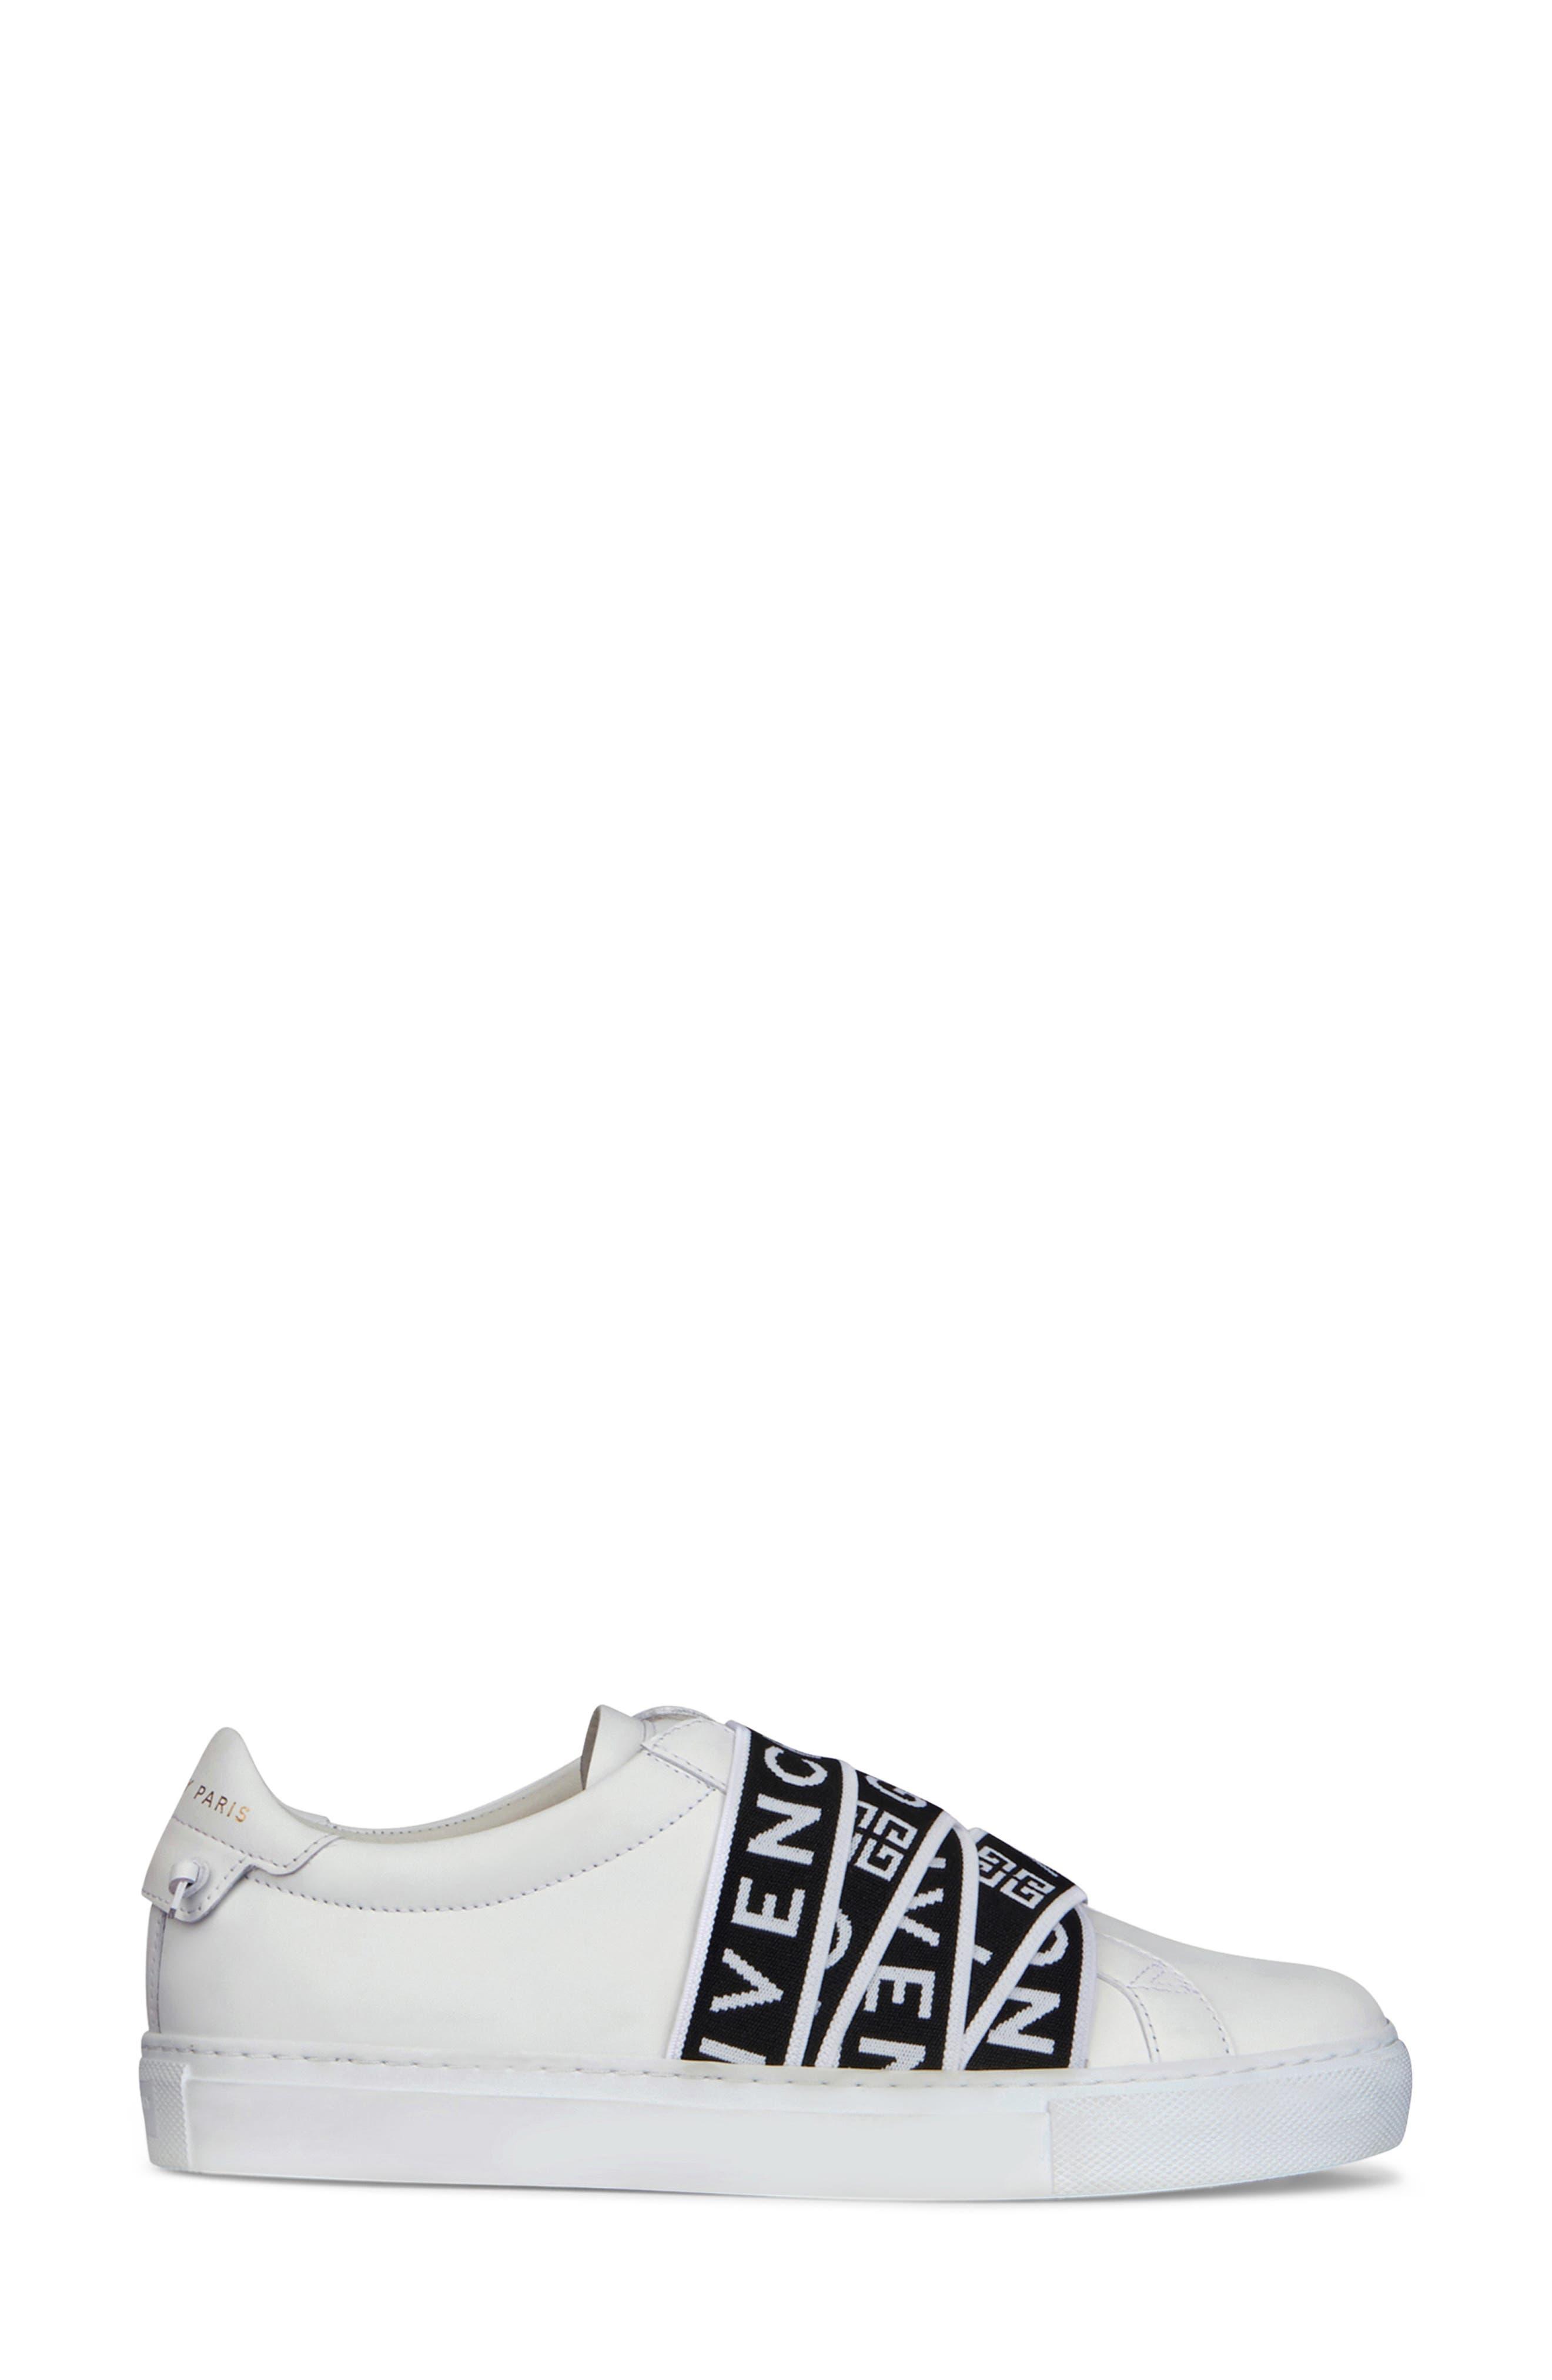 GIVENCHY,                             Urban Street Logo Strap Sneaker,                             Alternate thumbnail 2, color,                             WHITE/ BLACK